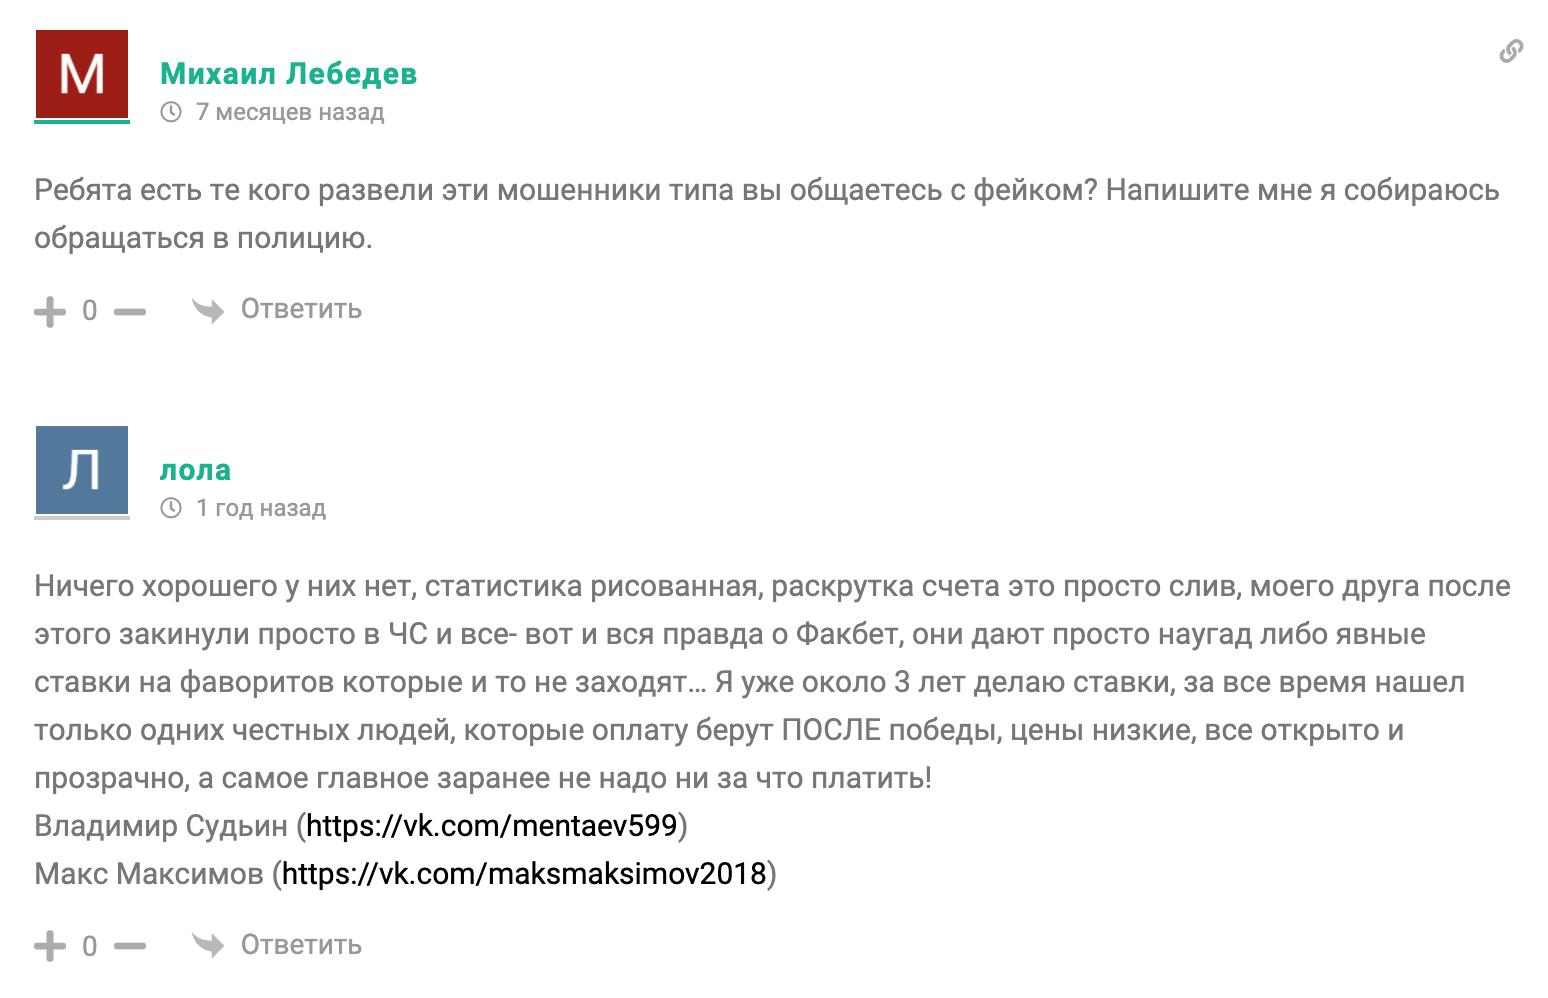 Отзывы о проекте Fuckbet (Факбет)